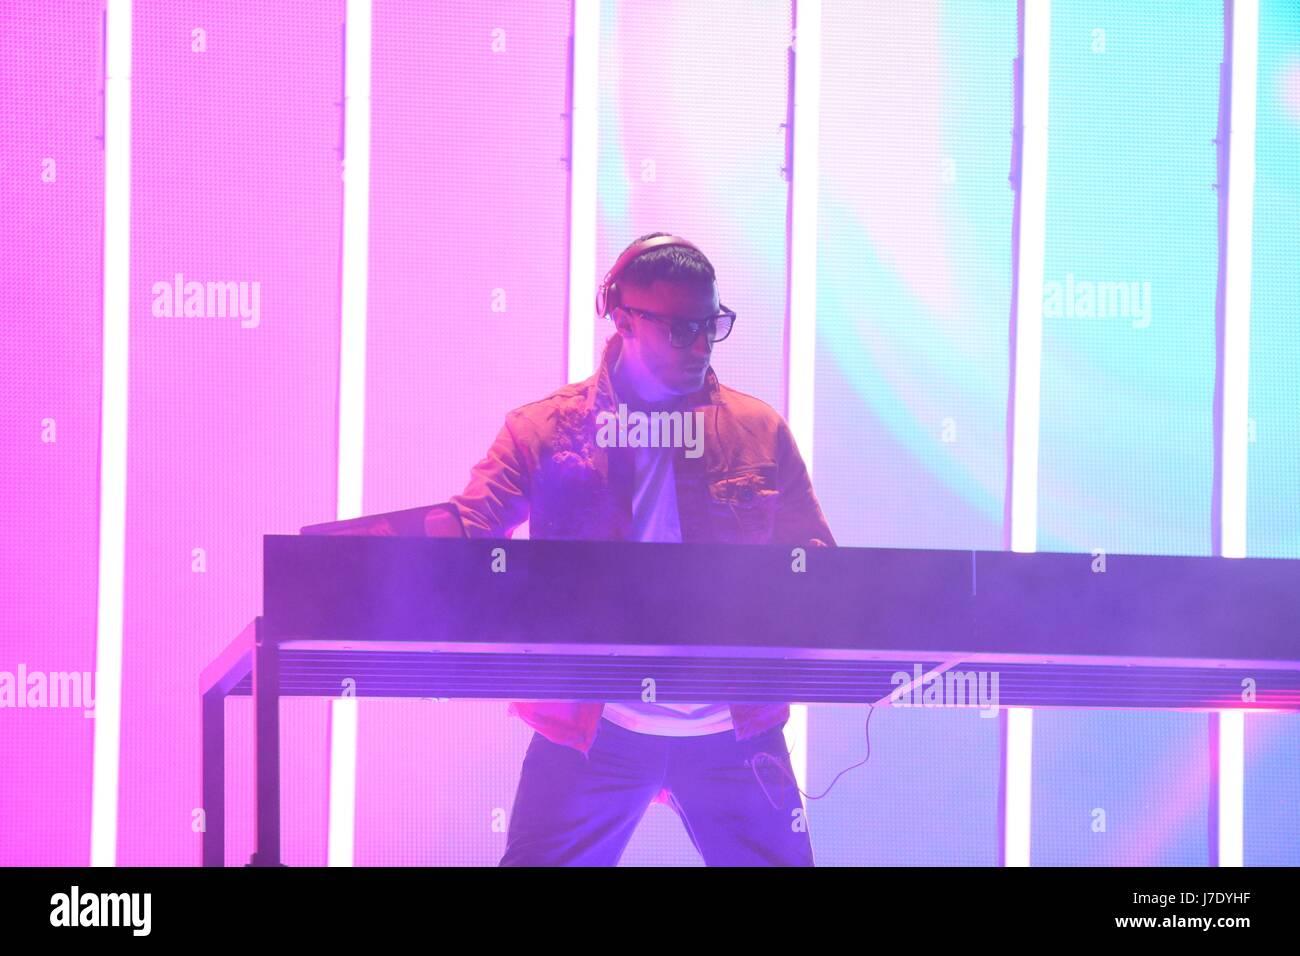 6d0ffbf75ef DJ Snake seen performing at Coachella weekend 2 day 2 Featuring  DJ Snake